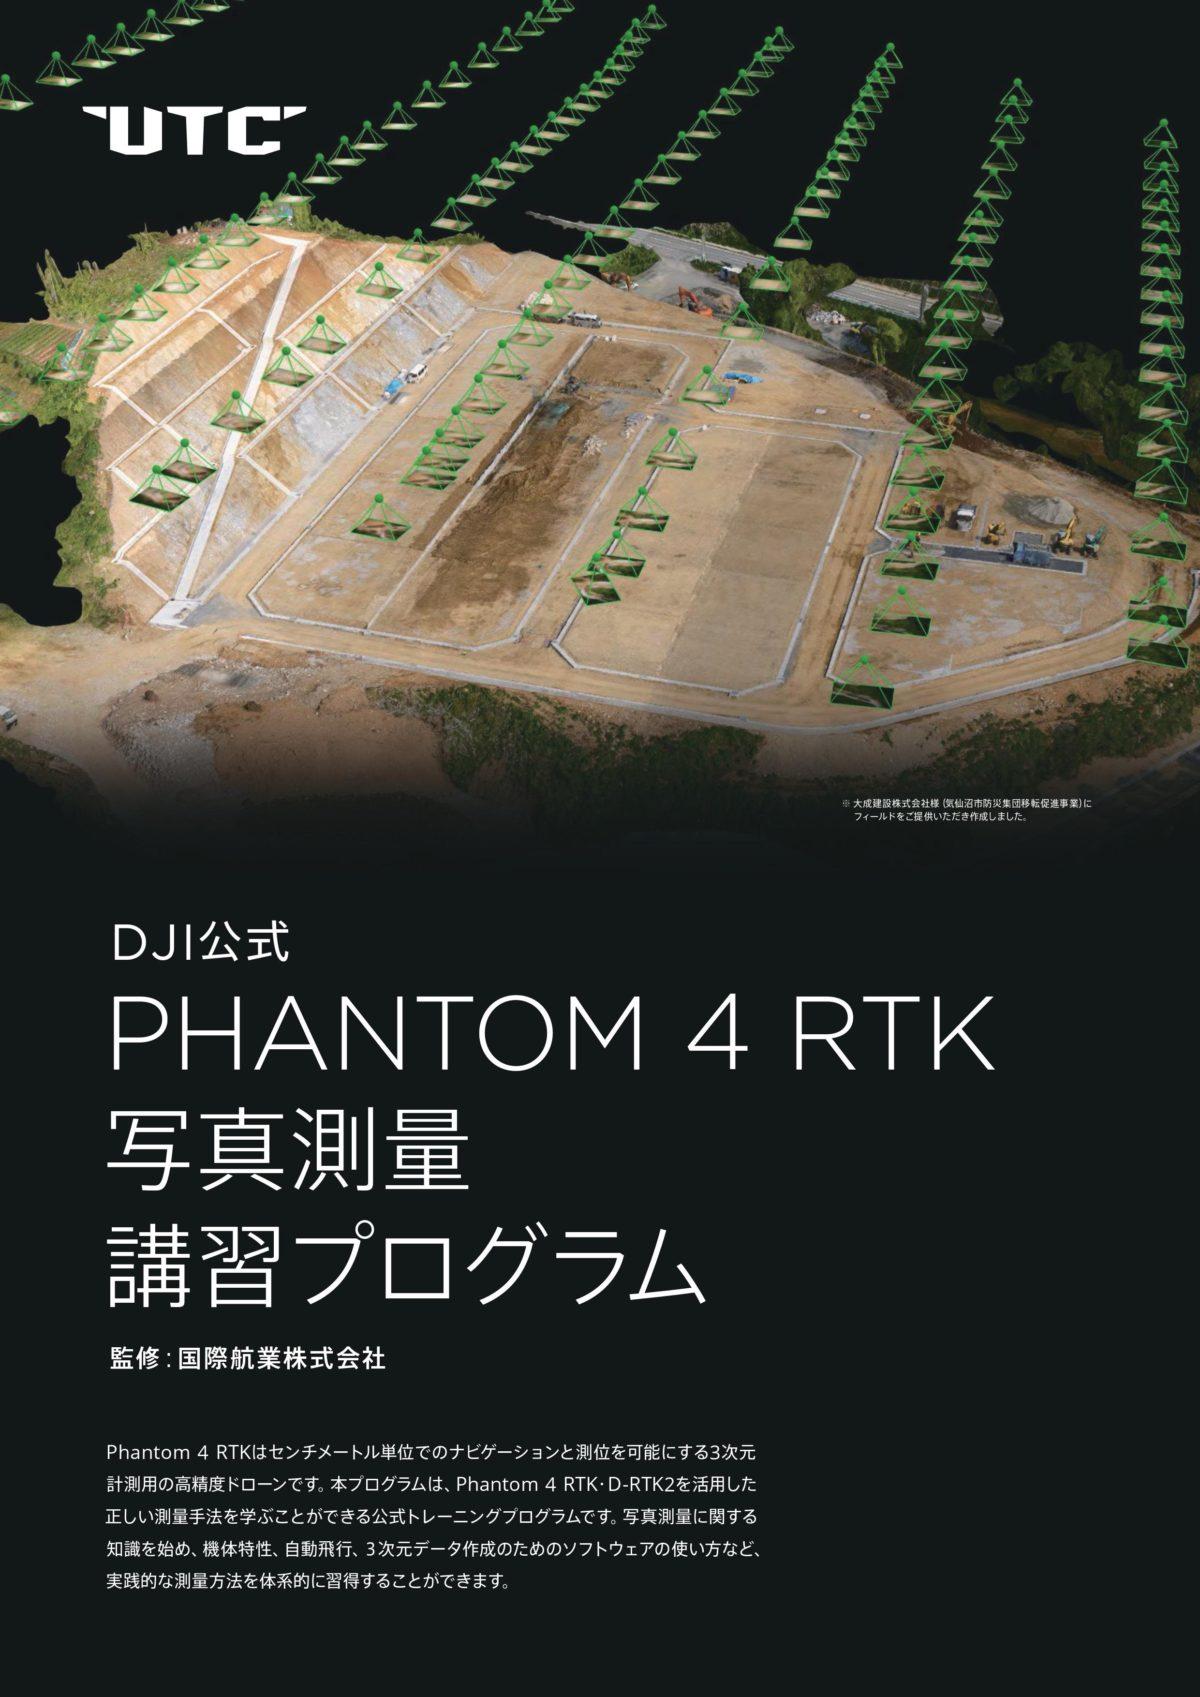 DJI公式 PHANTOM 4 RTK 写真測量 講習プログラム 監修:国際航業株式会社 プログラムパンフレット